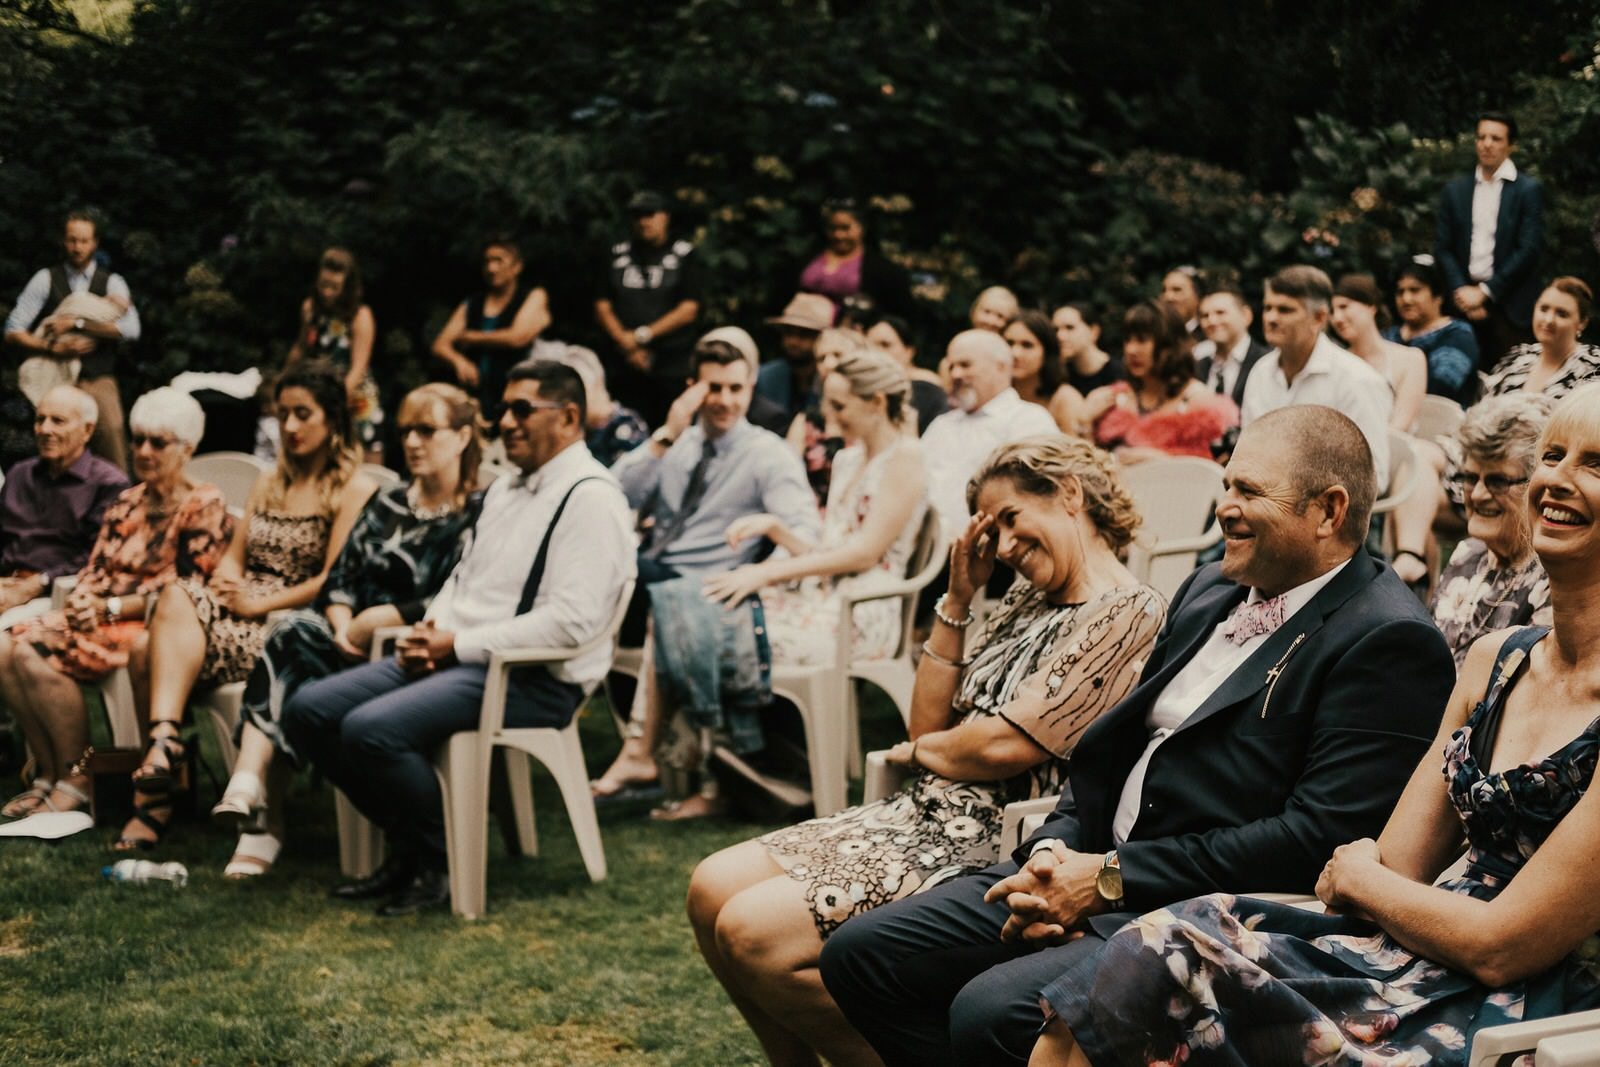 Wairarapa-Wedding_The-Landing_043.JPG